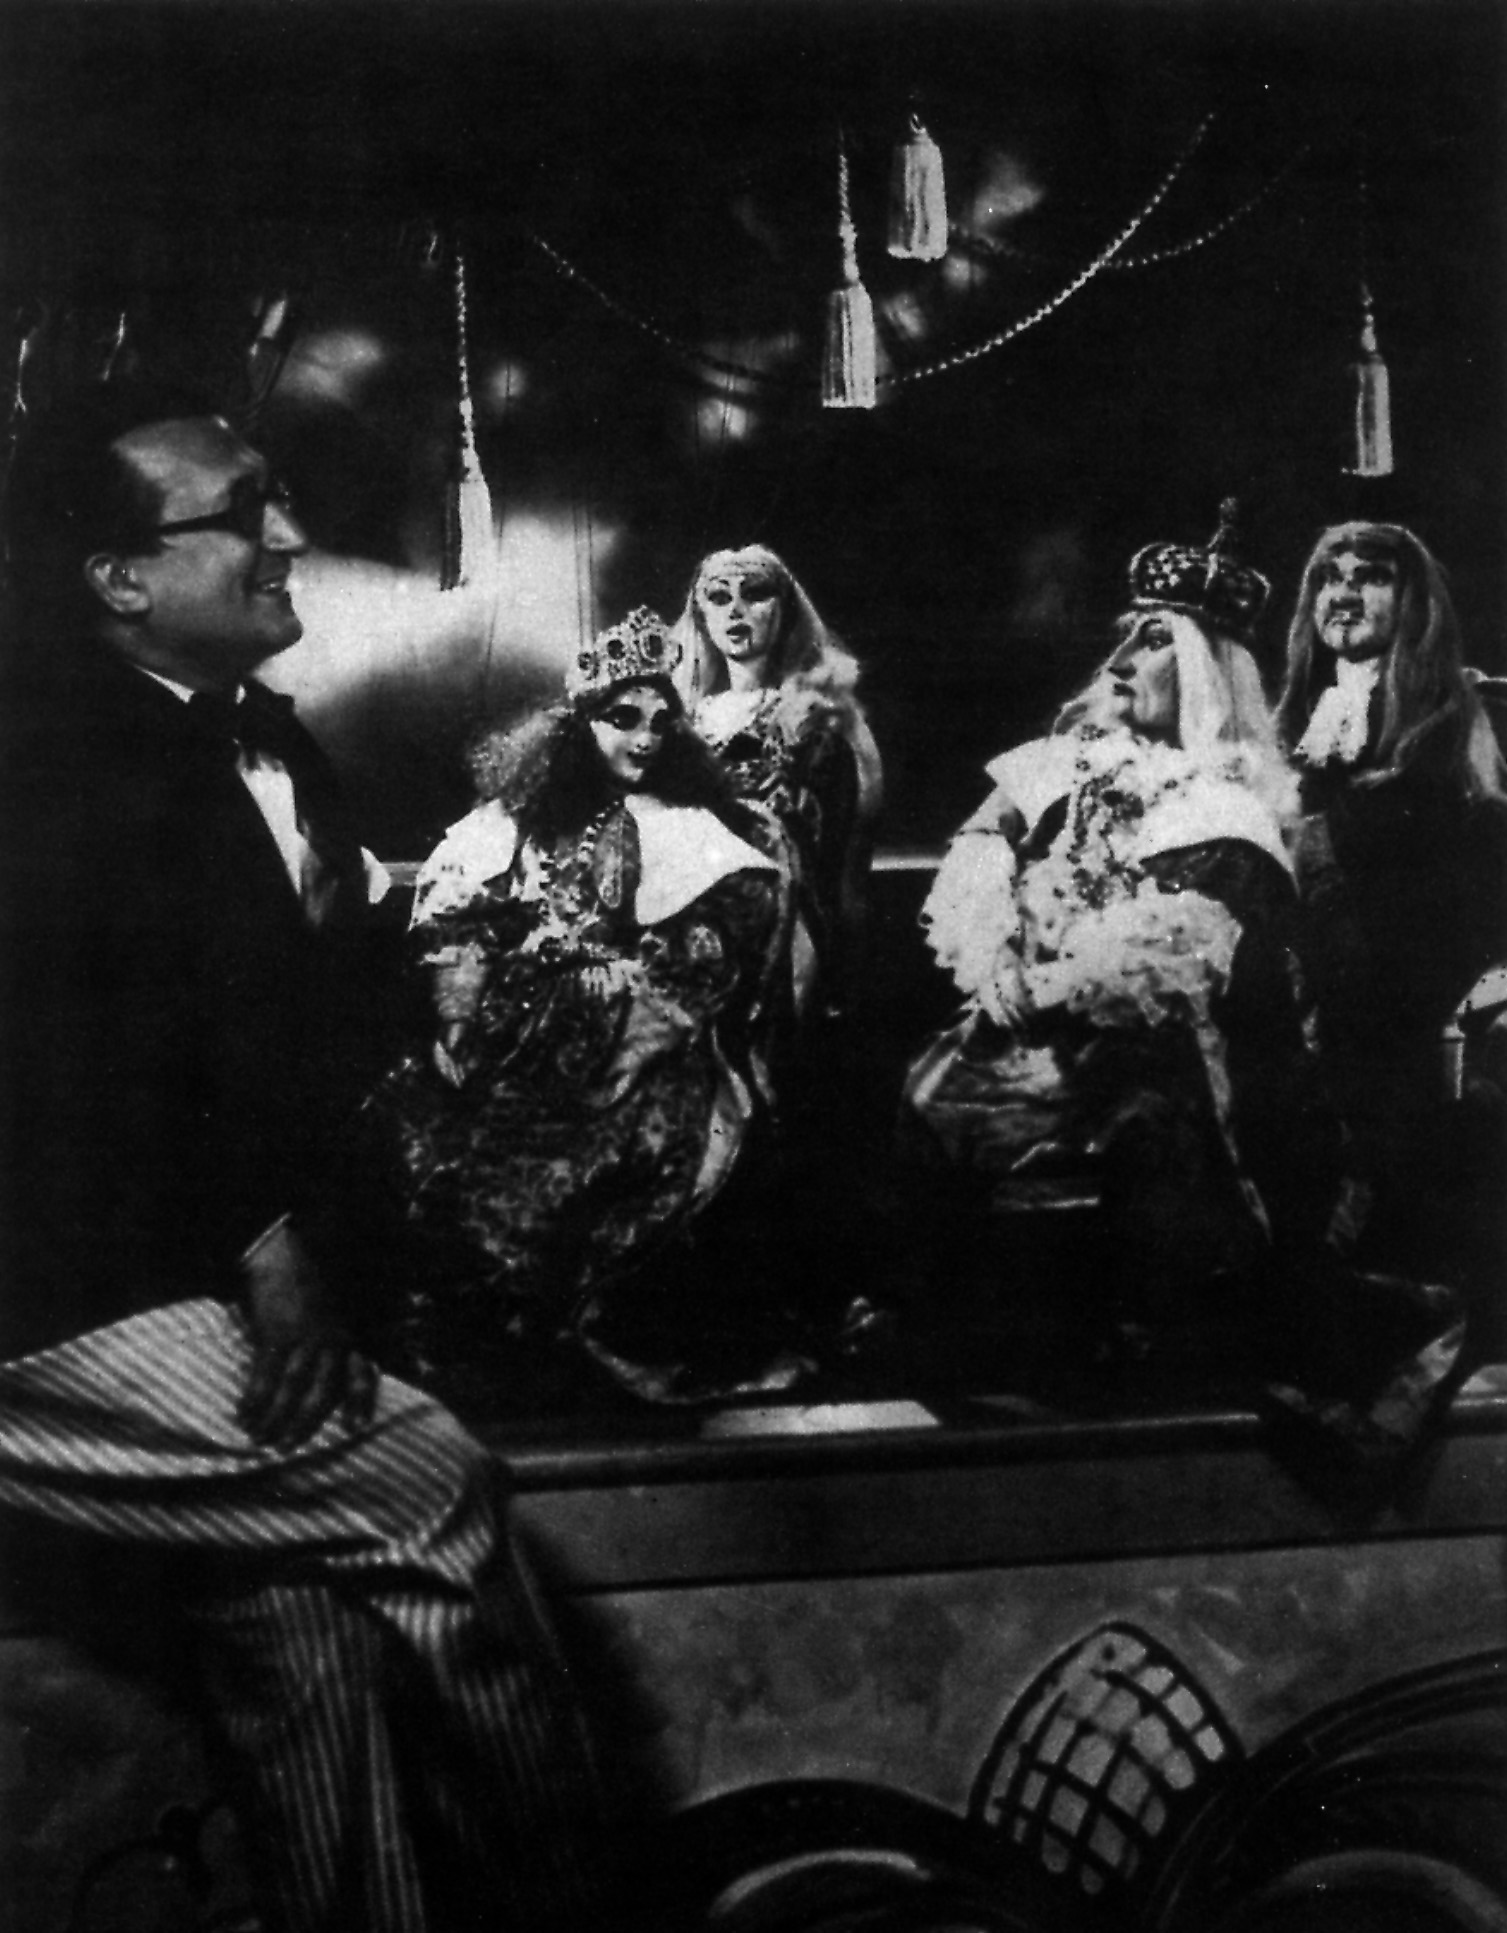 Vittorio Podrecca avec des marionnettes de la production du Teatro dei Piccoli de <em>La bella addormentata nel bosco</em> (1922) composée par Ottorino Respighi et basée sur le conte de Charles Perrault. Collezione Maria Signorelli. Photo réproduite avec l'aimable autorisation de Istituto per i Beni Marionettistici e il Teatro Popolare (Turin, Italie)